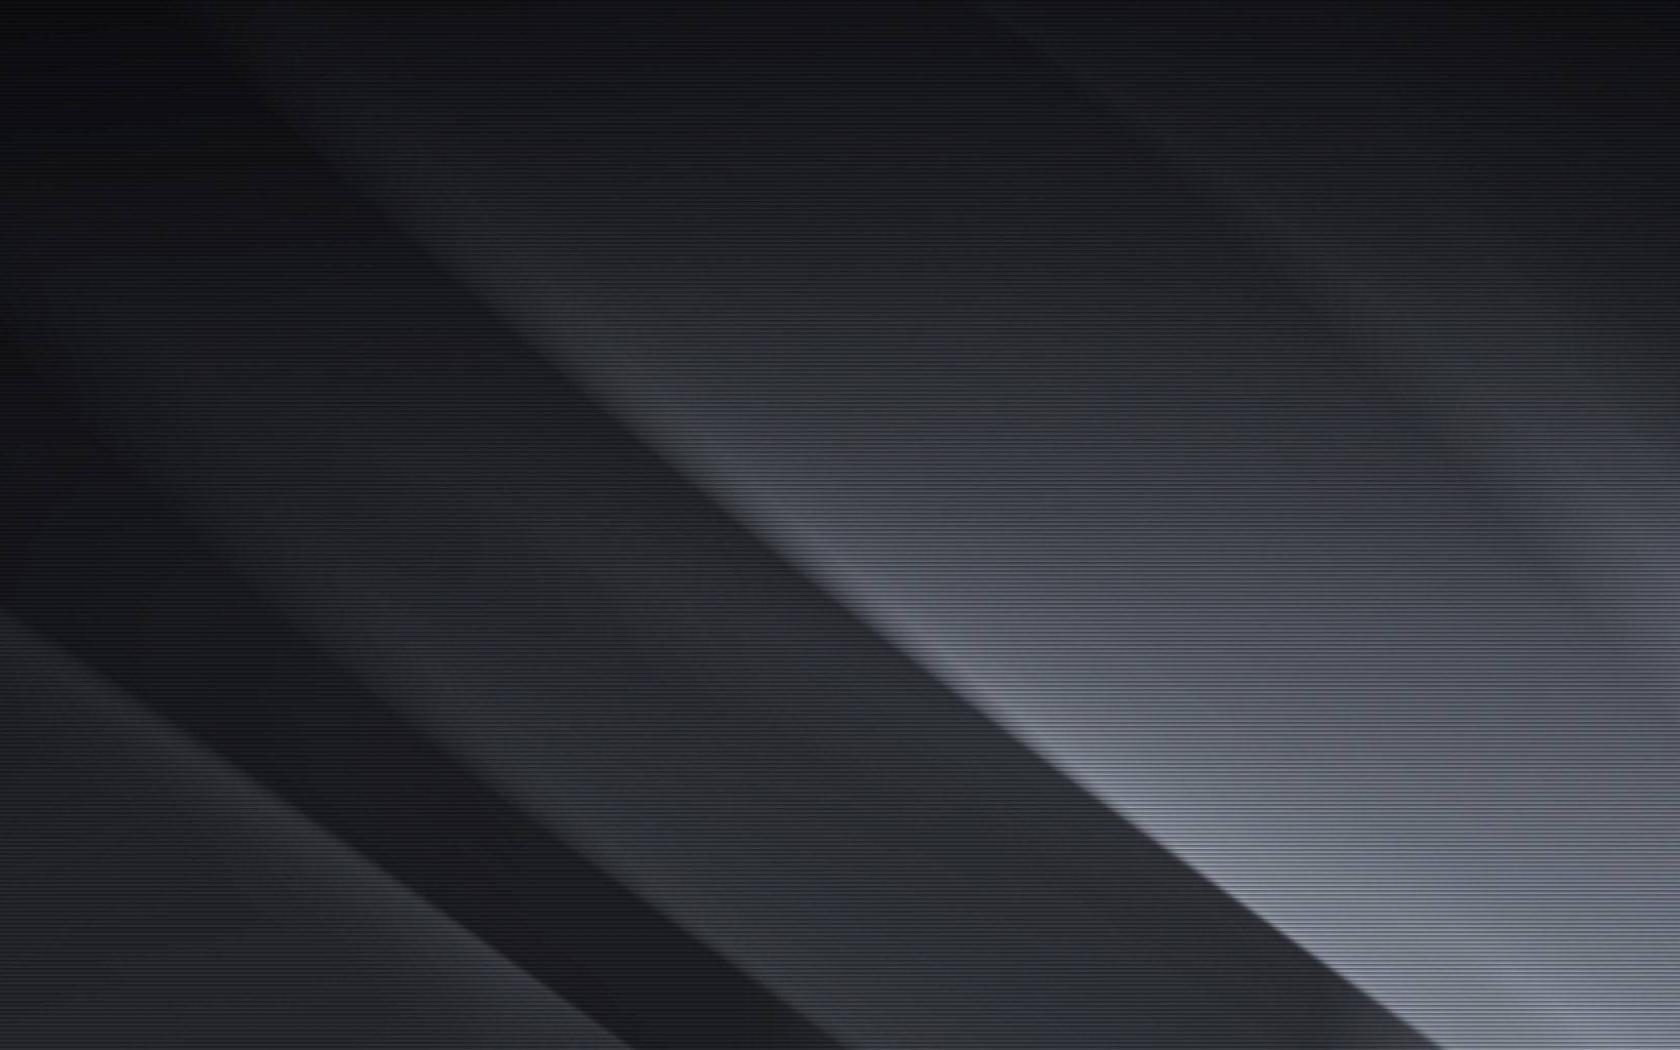 Dual screen abstract art wallpaper HQ WALLPAPER   6747 1680x1050